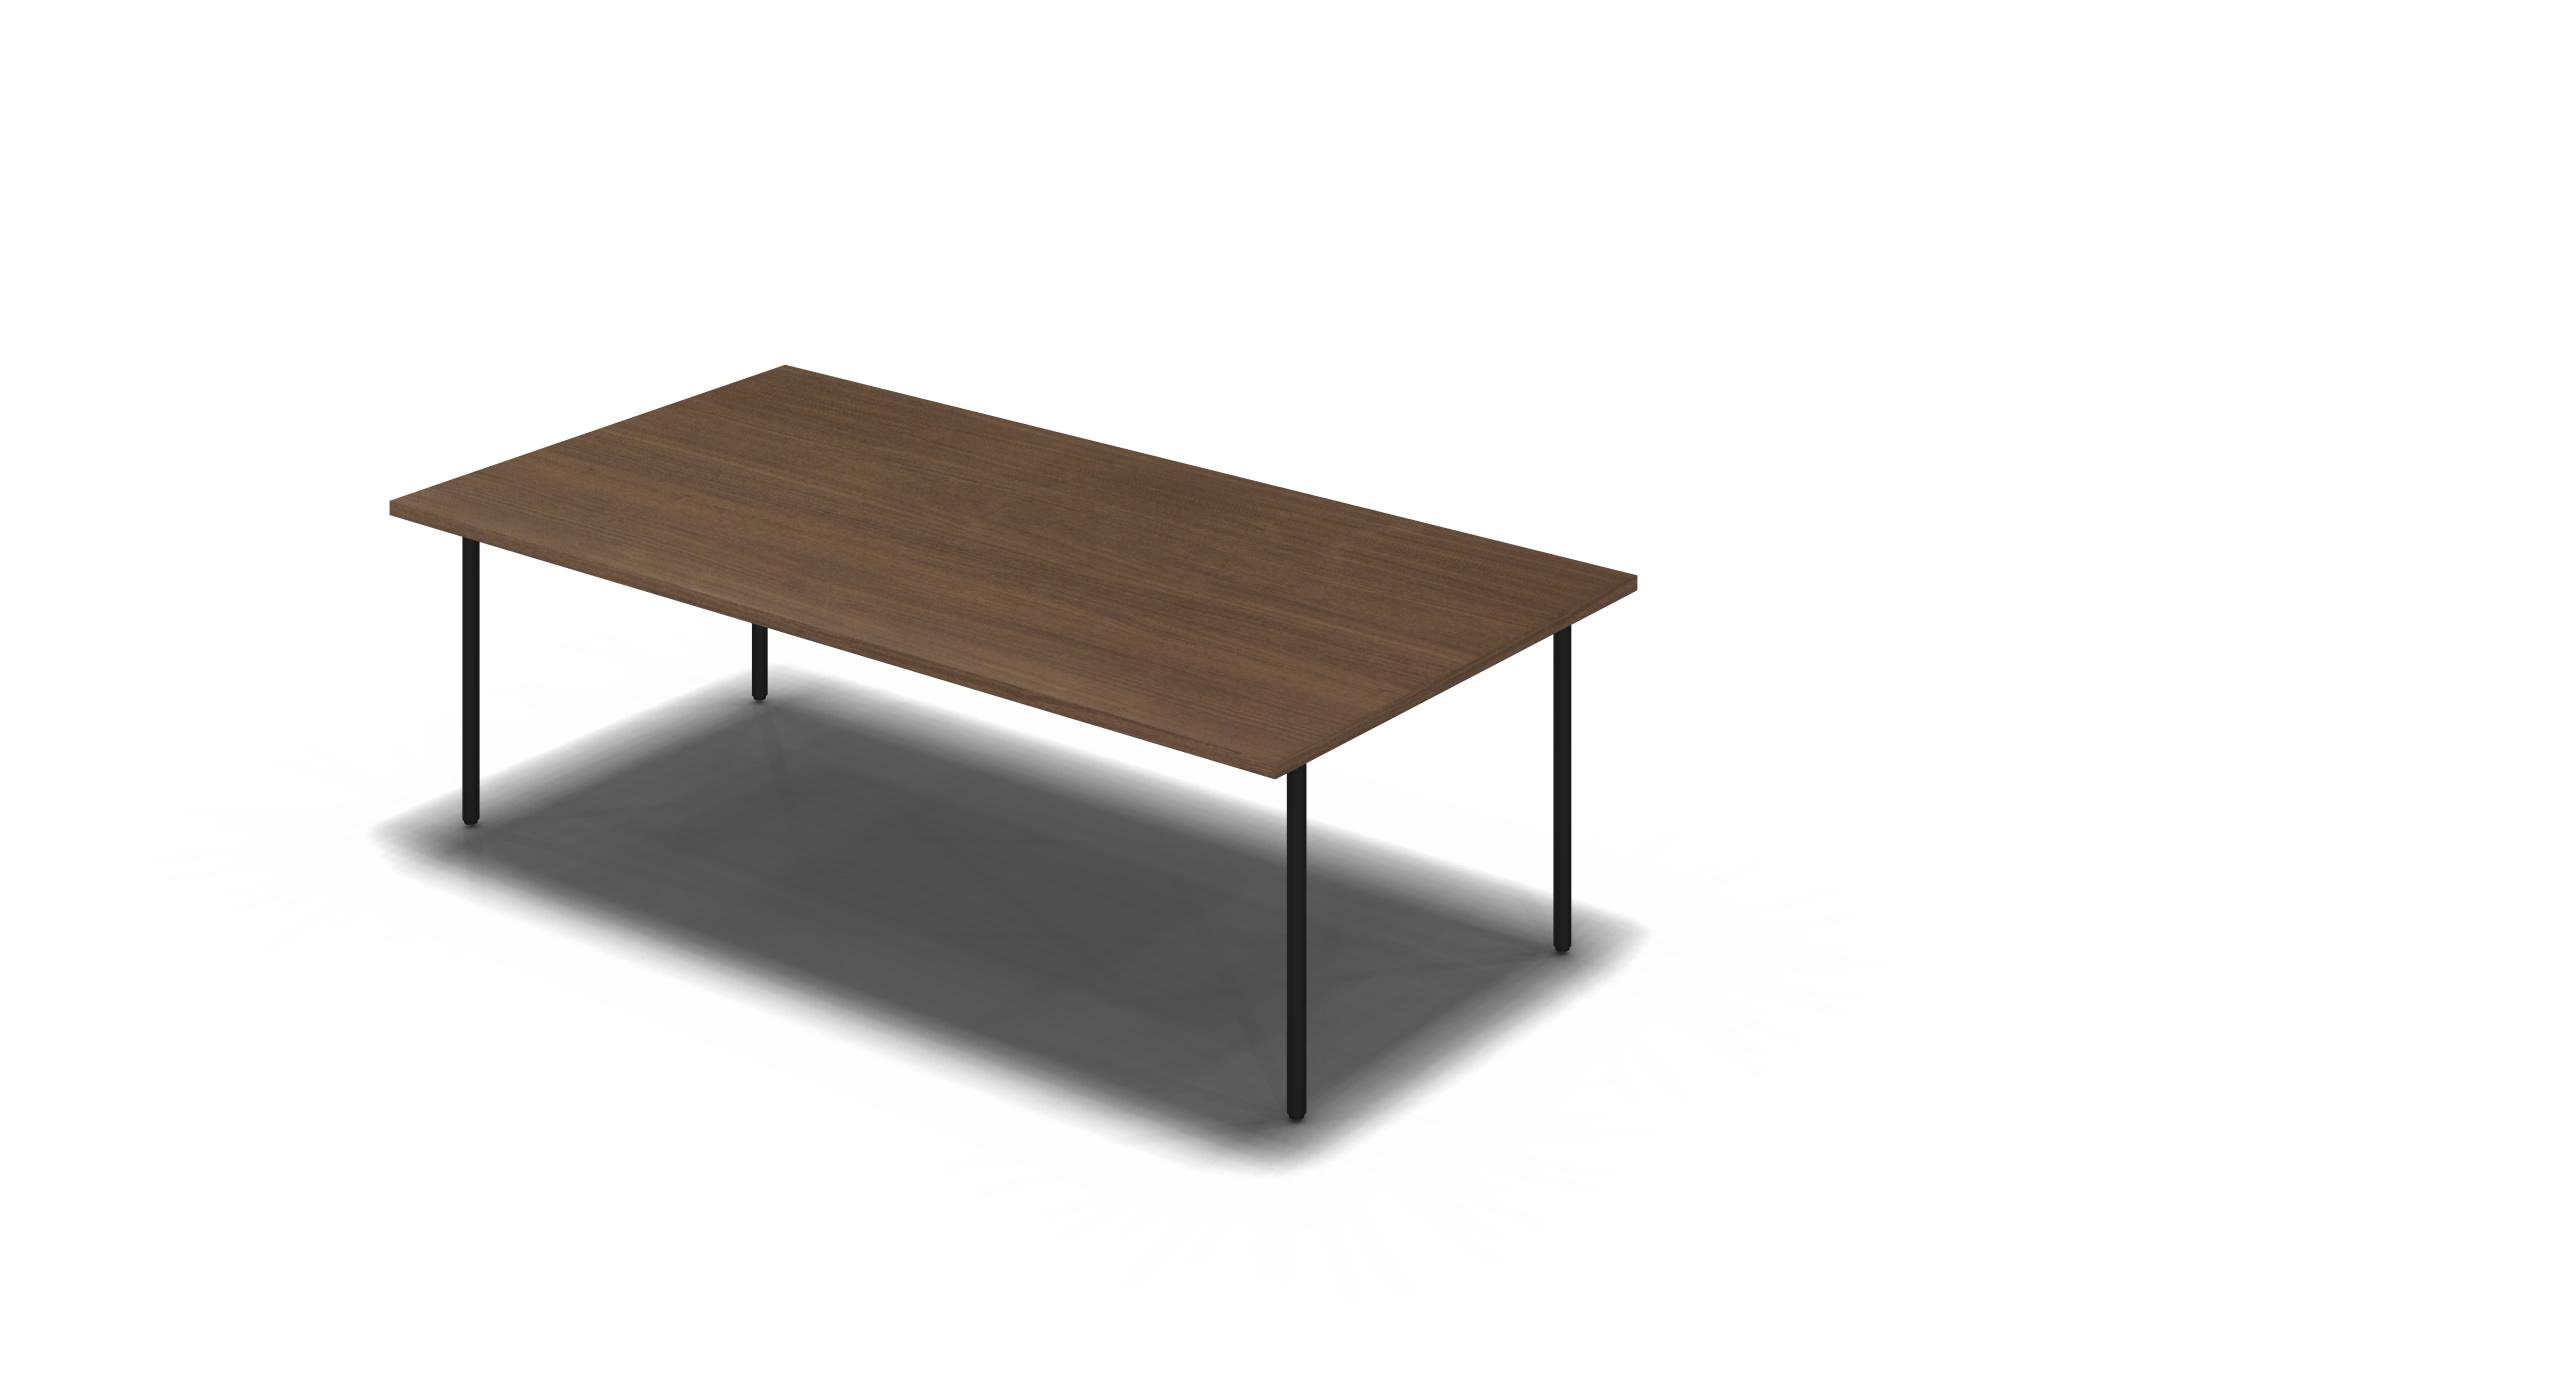 Table_Round_2100x1050_Black_Walnut_noOption